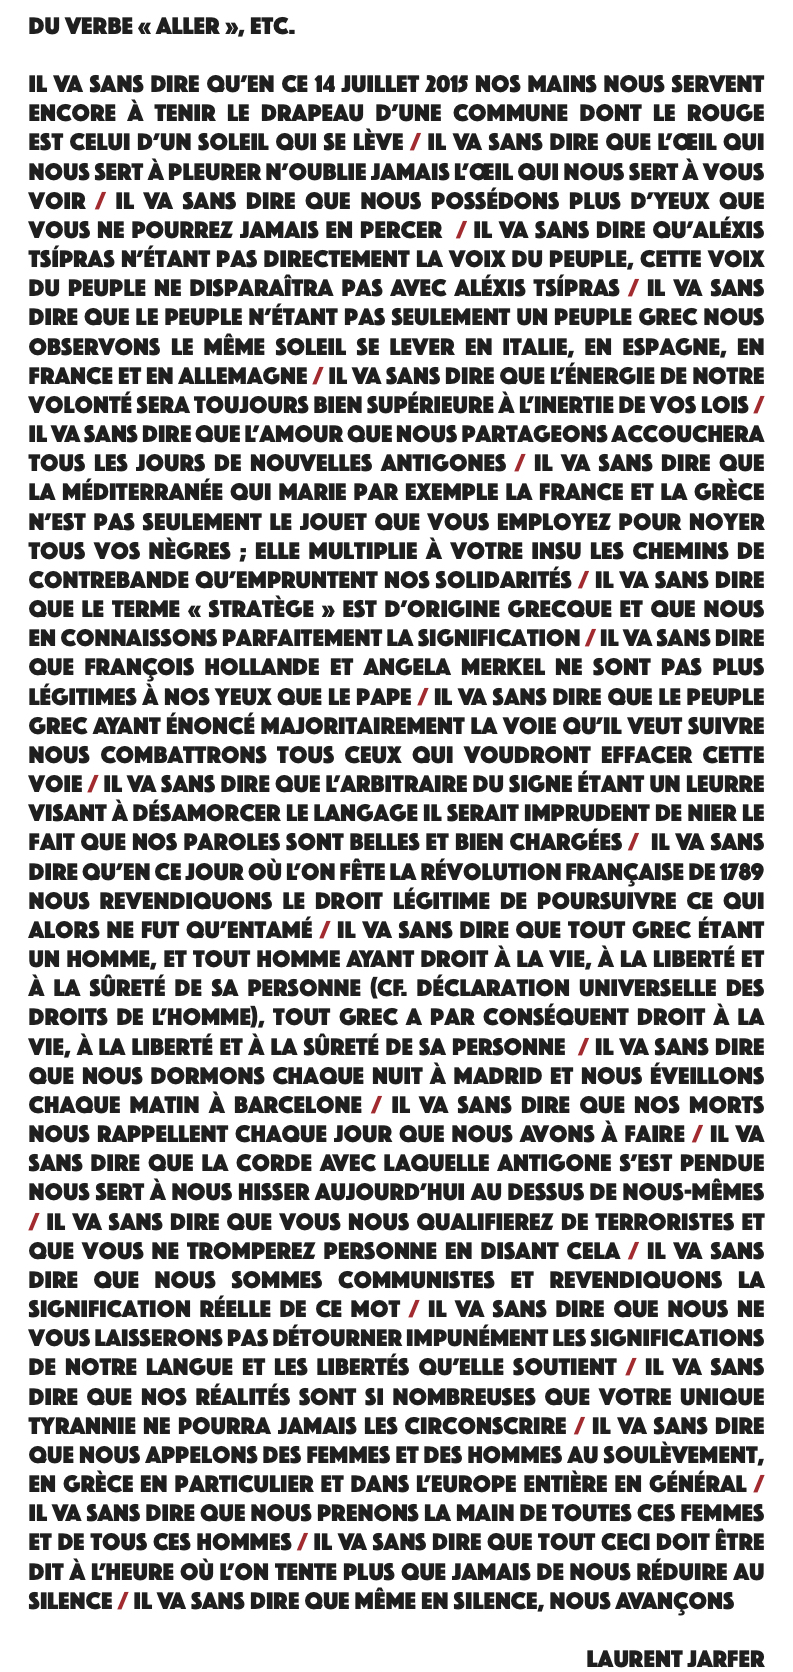 Laurent jarfer